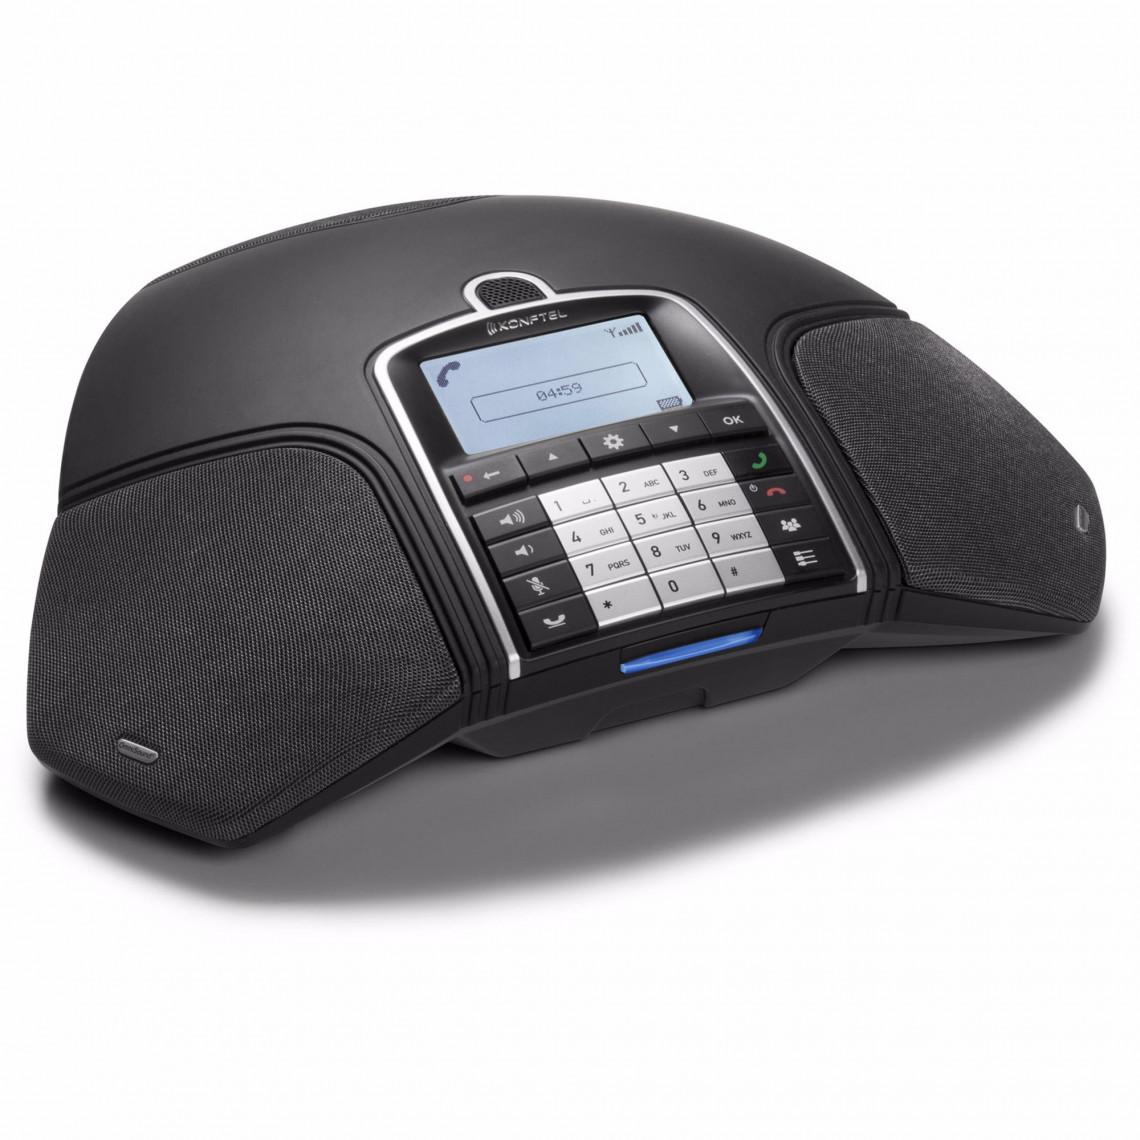 Konftel 300Wx - Konferenstelefon